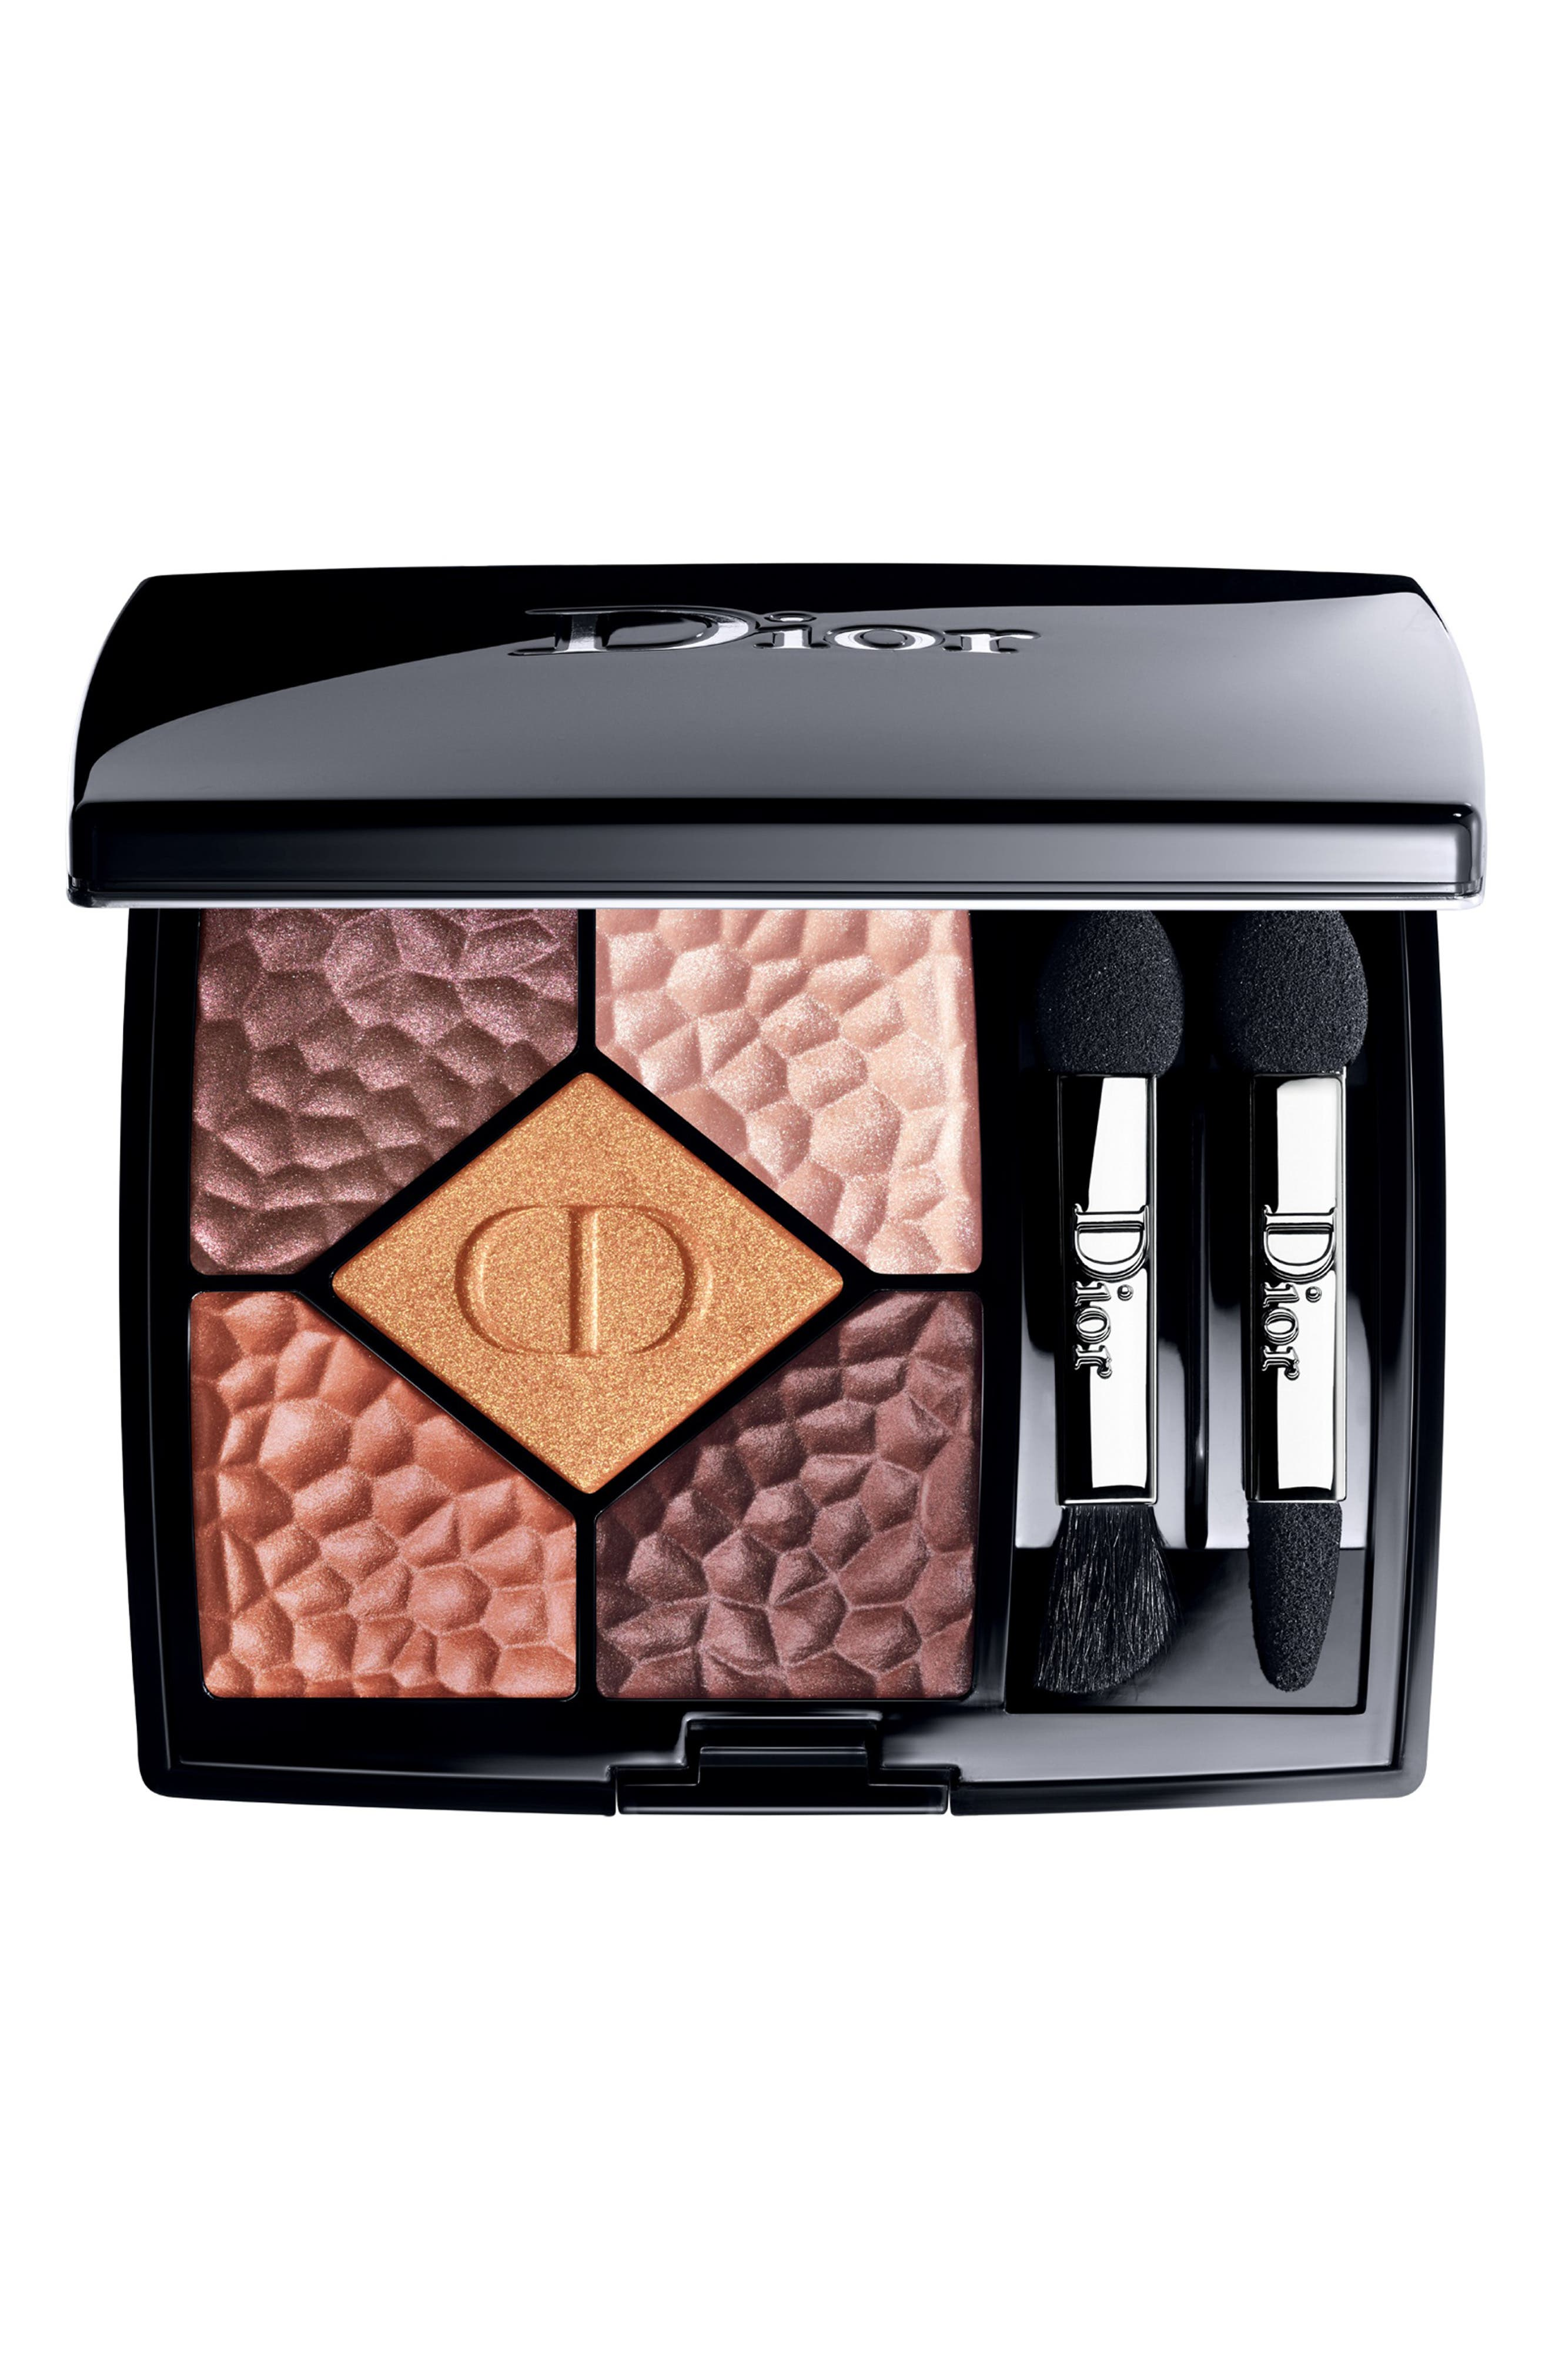 DIOR, Diorshow 5 Couleurs Colors & Effects Eyeshadow Palette, Main thumbnail 1, color, 786 TERRA